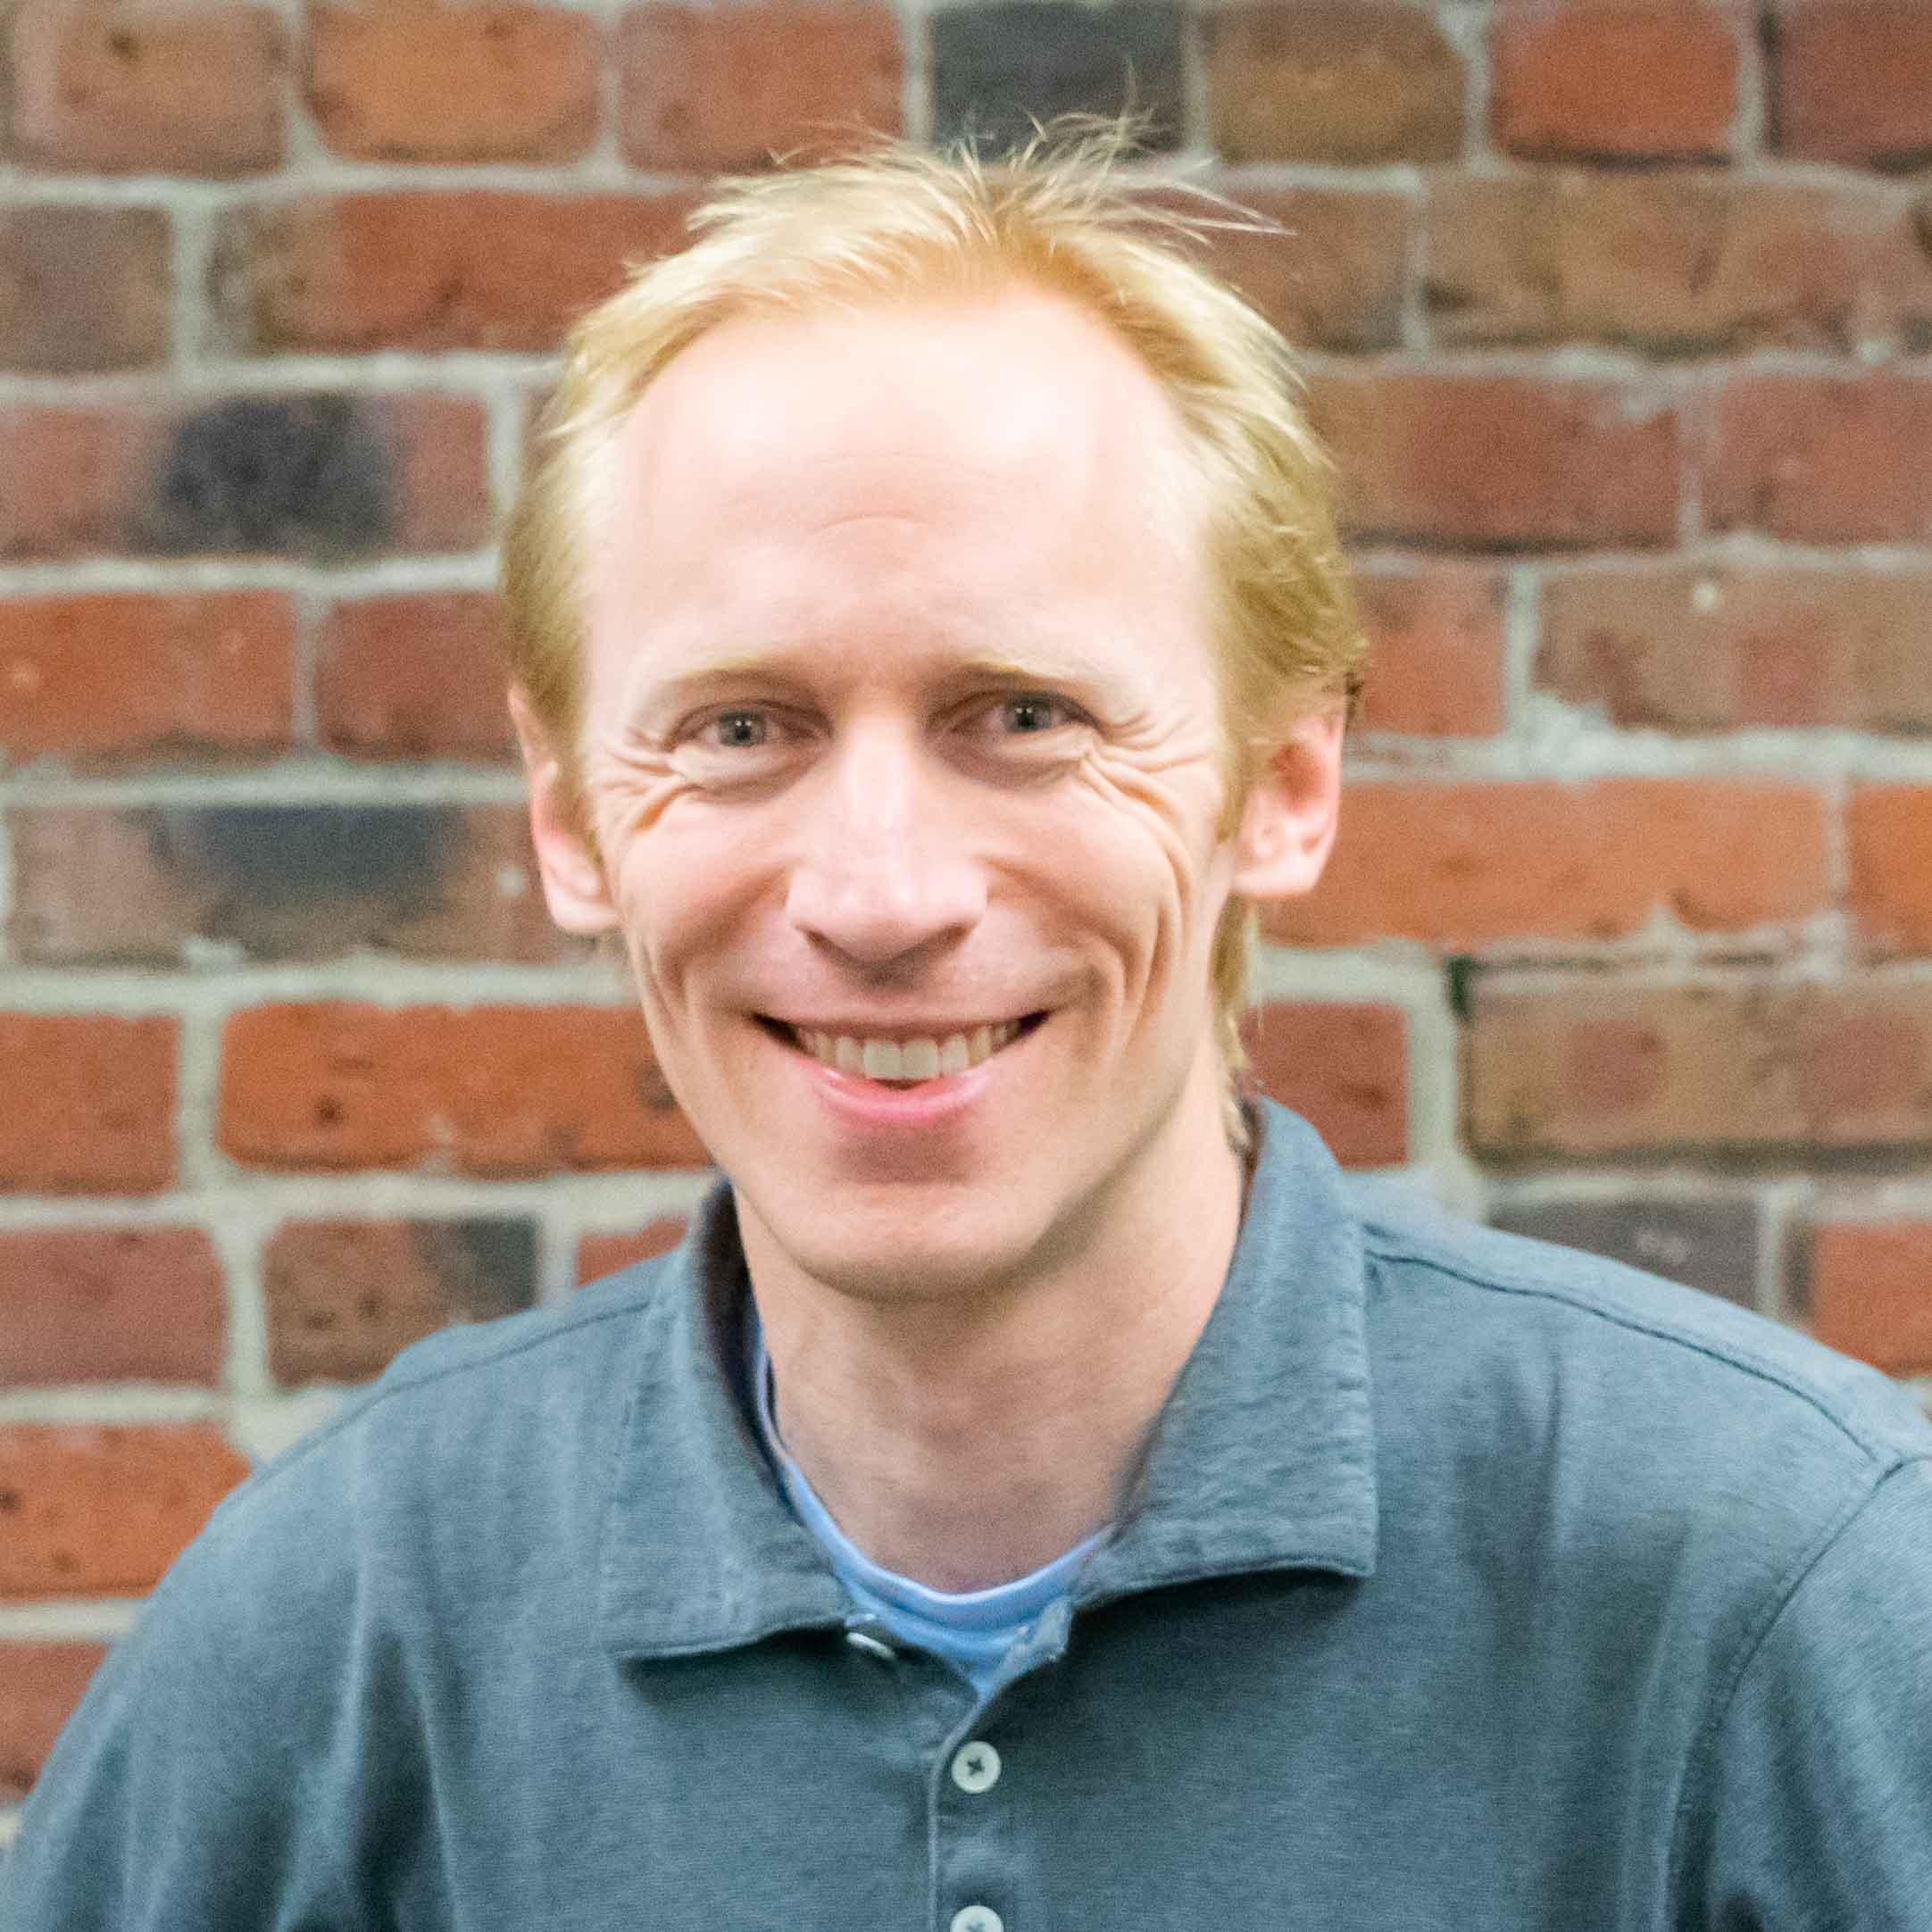 Dave-naffziger-headshot